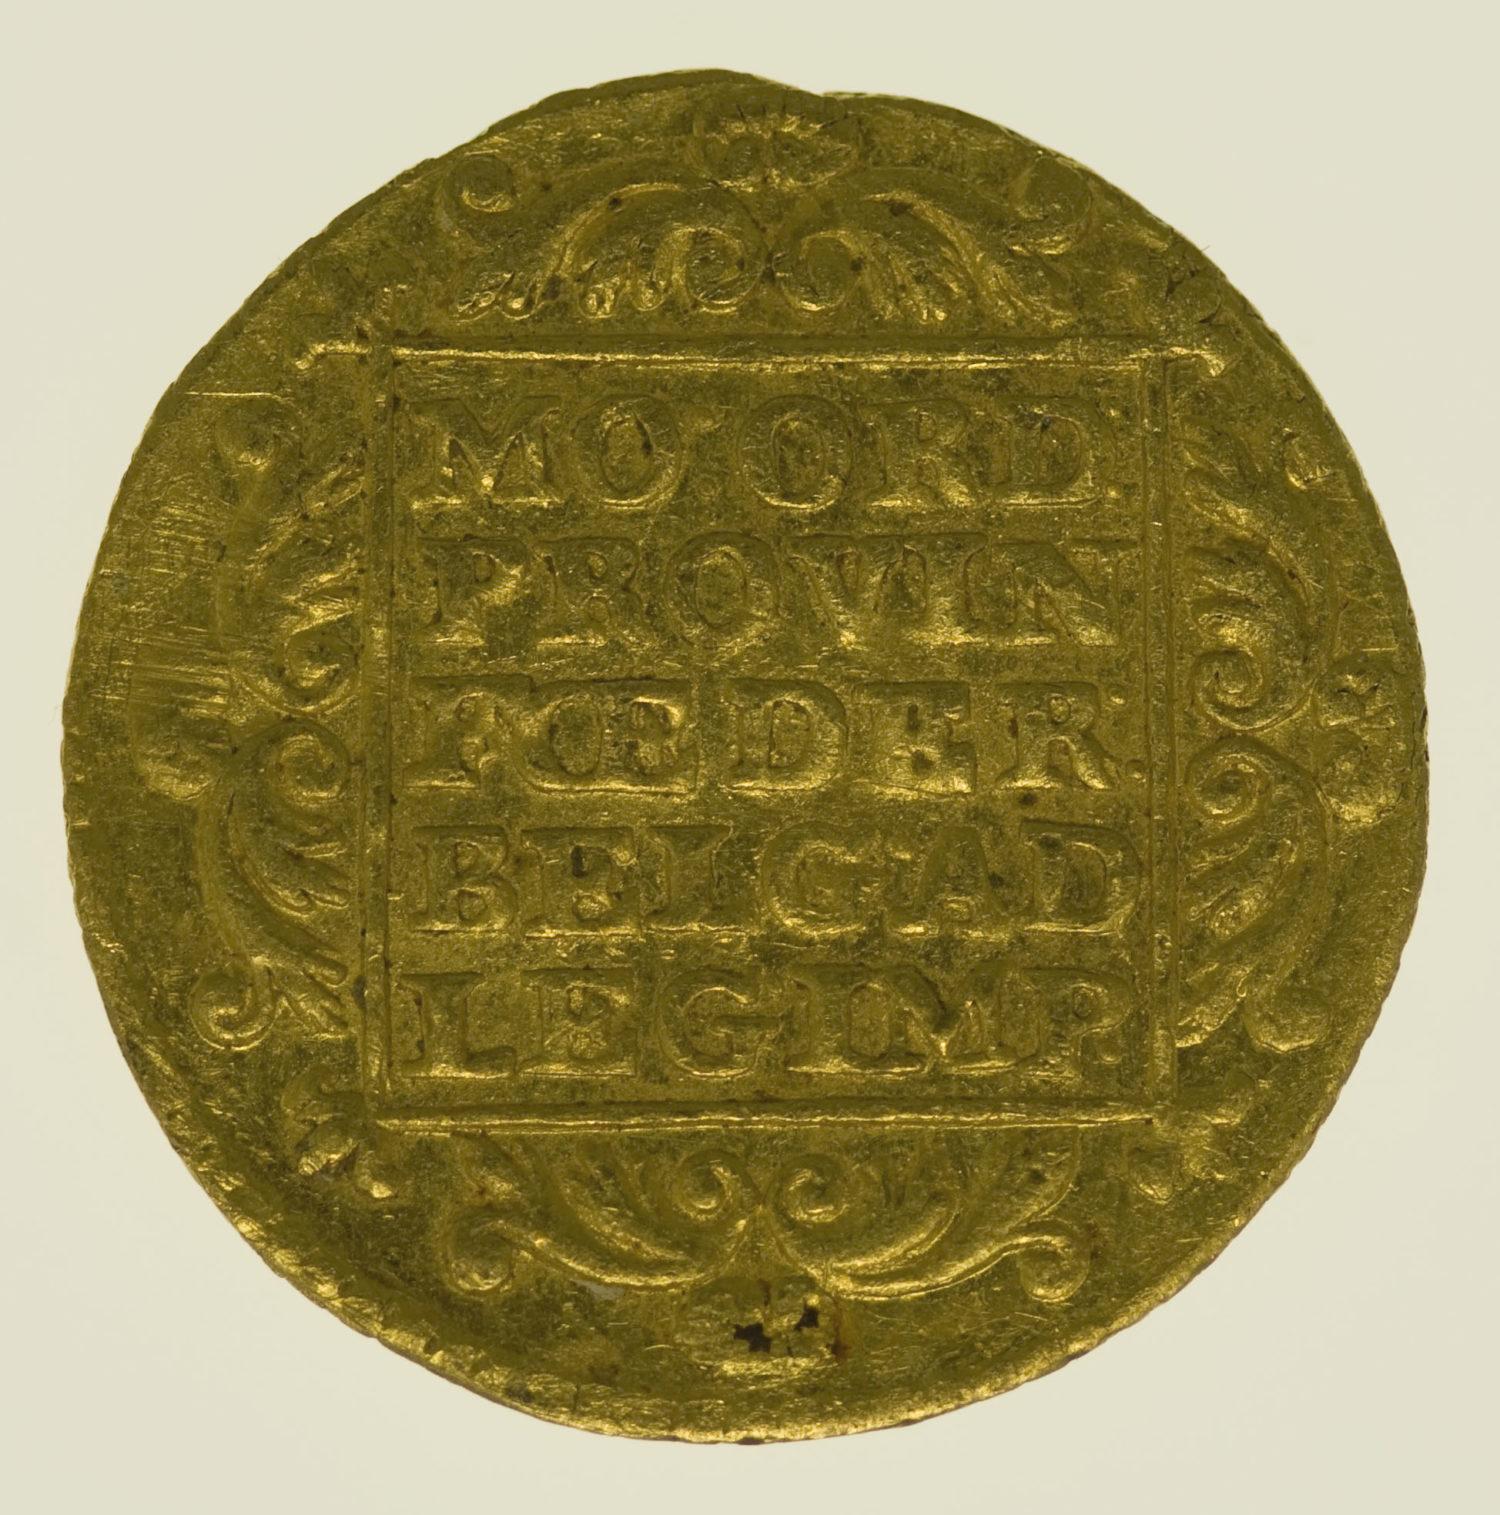 niederlande - Niederlande Geldern Dukat 1763